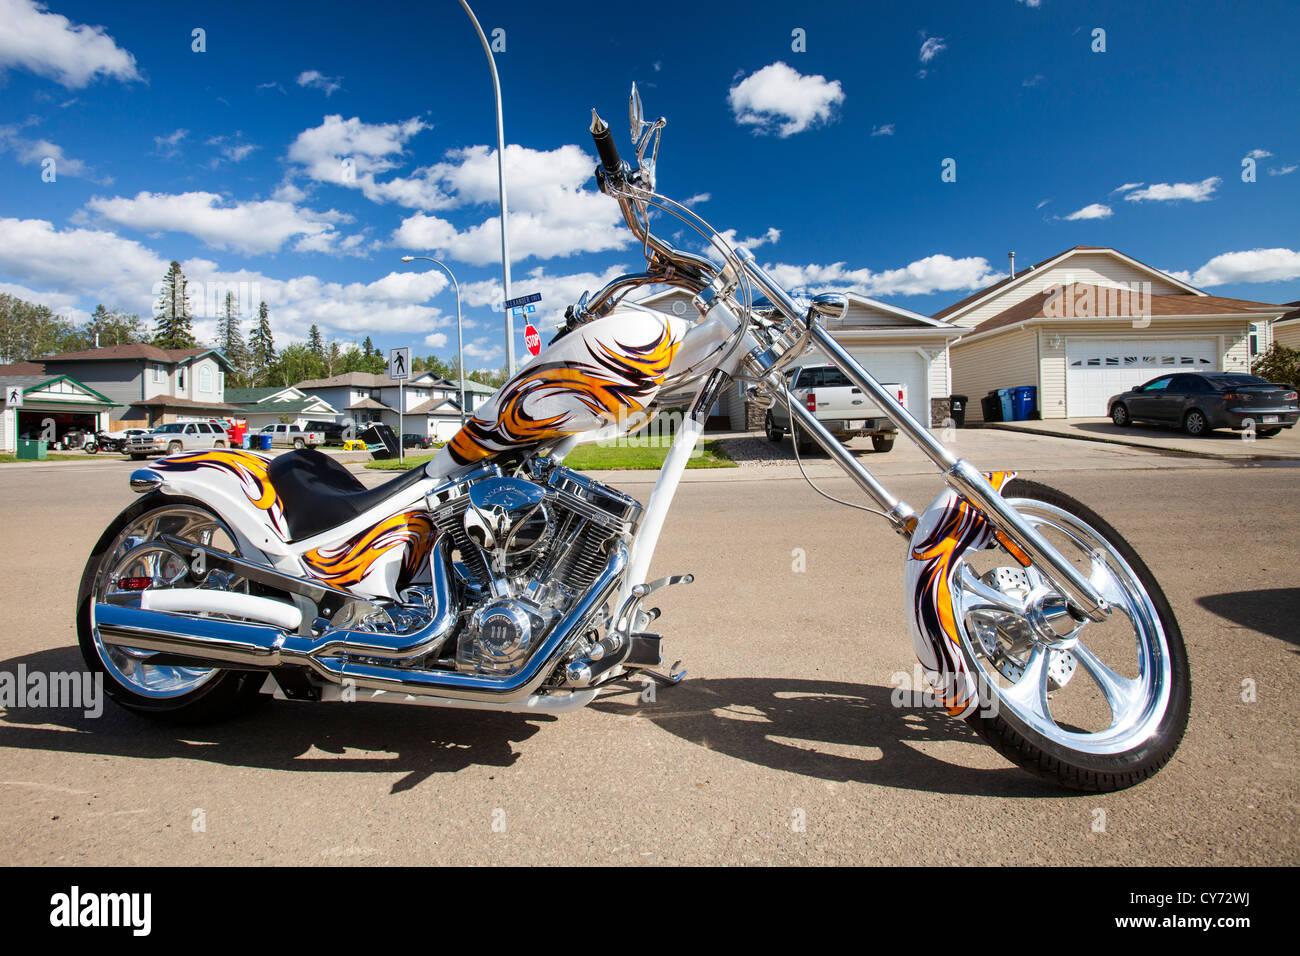 American Iron horse, Texas chopper motorbike Stock Photo